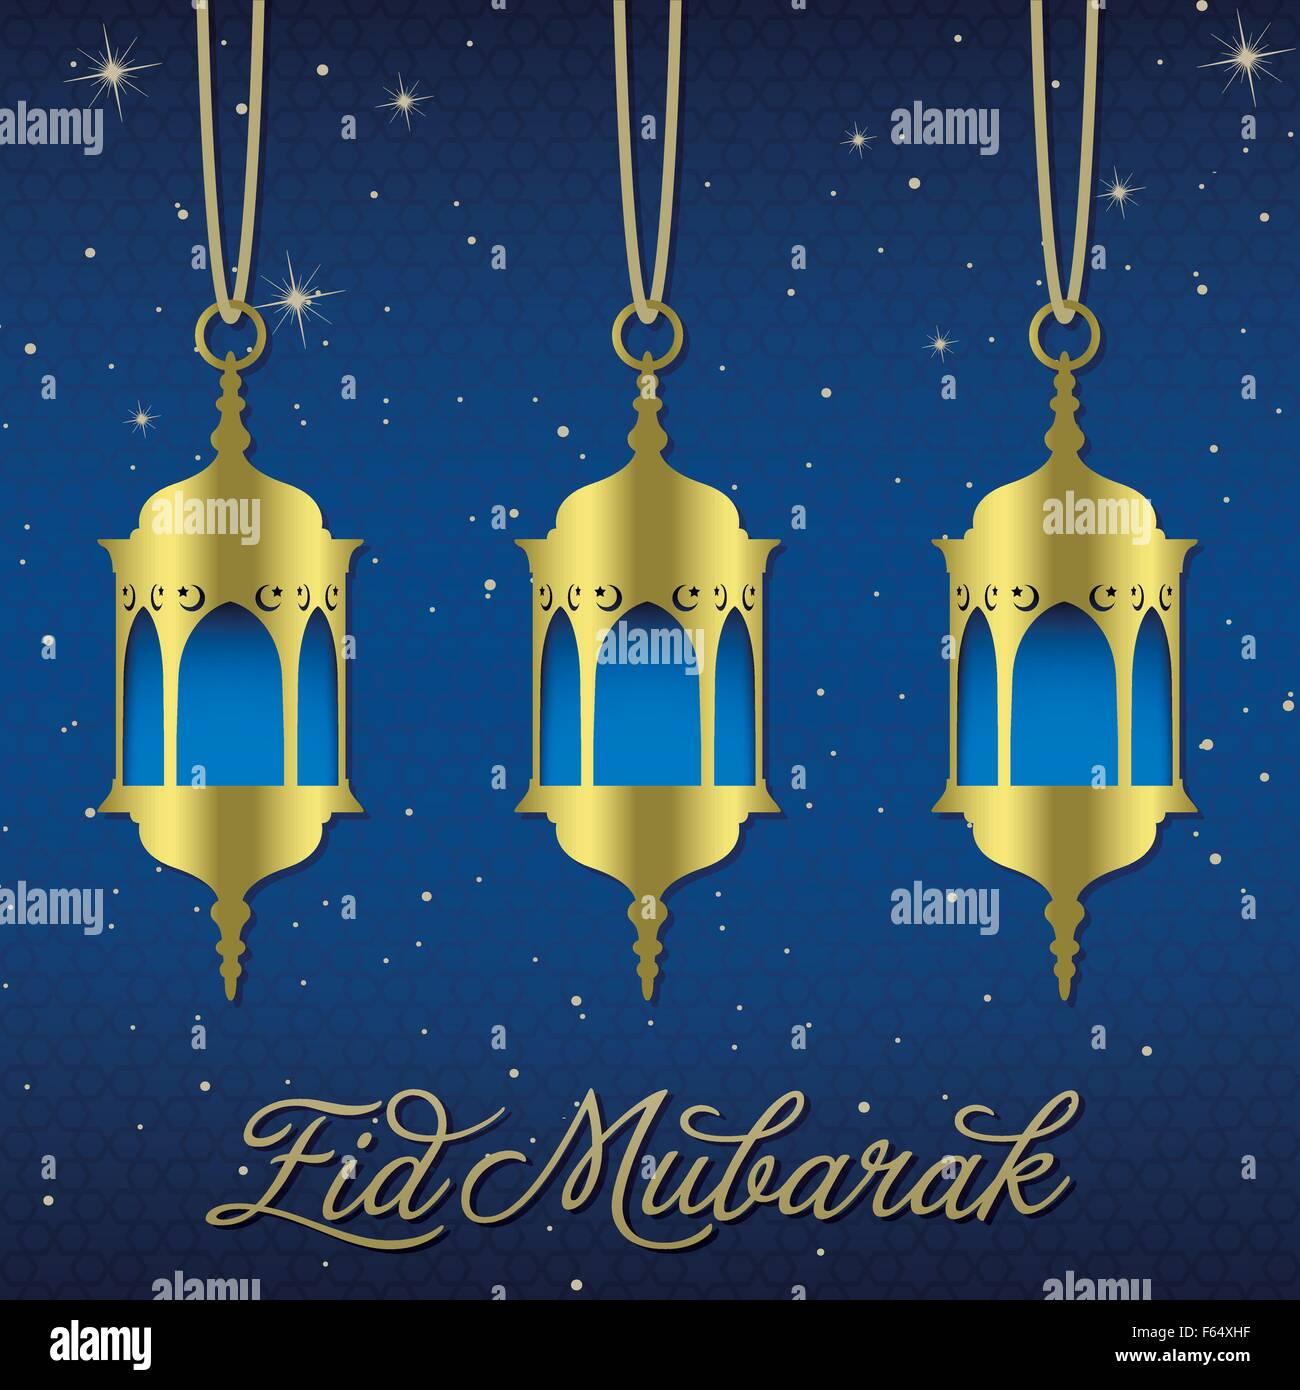 Eid mubarak blessed eid lantern greeting card in vector format eid mubarak blessed eid lantern greeting card in vector format kristyandbryce Image collections